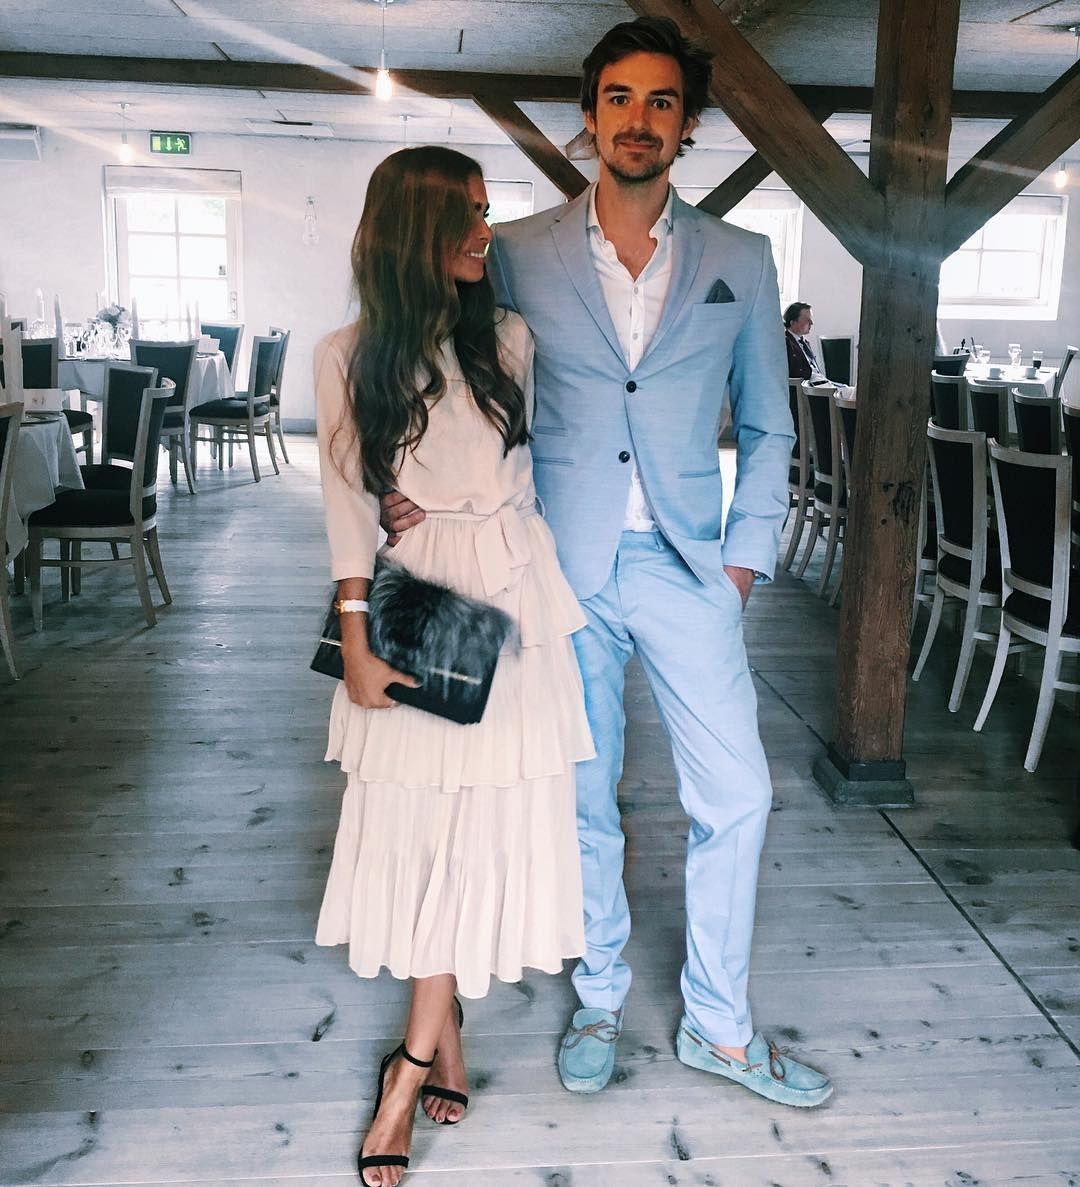 mariakragmann | Outfits of Delight | Pinterest | Summer chic, Beauty ...